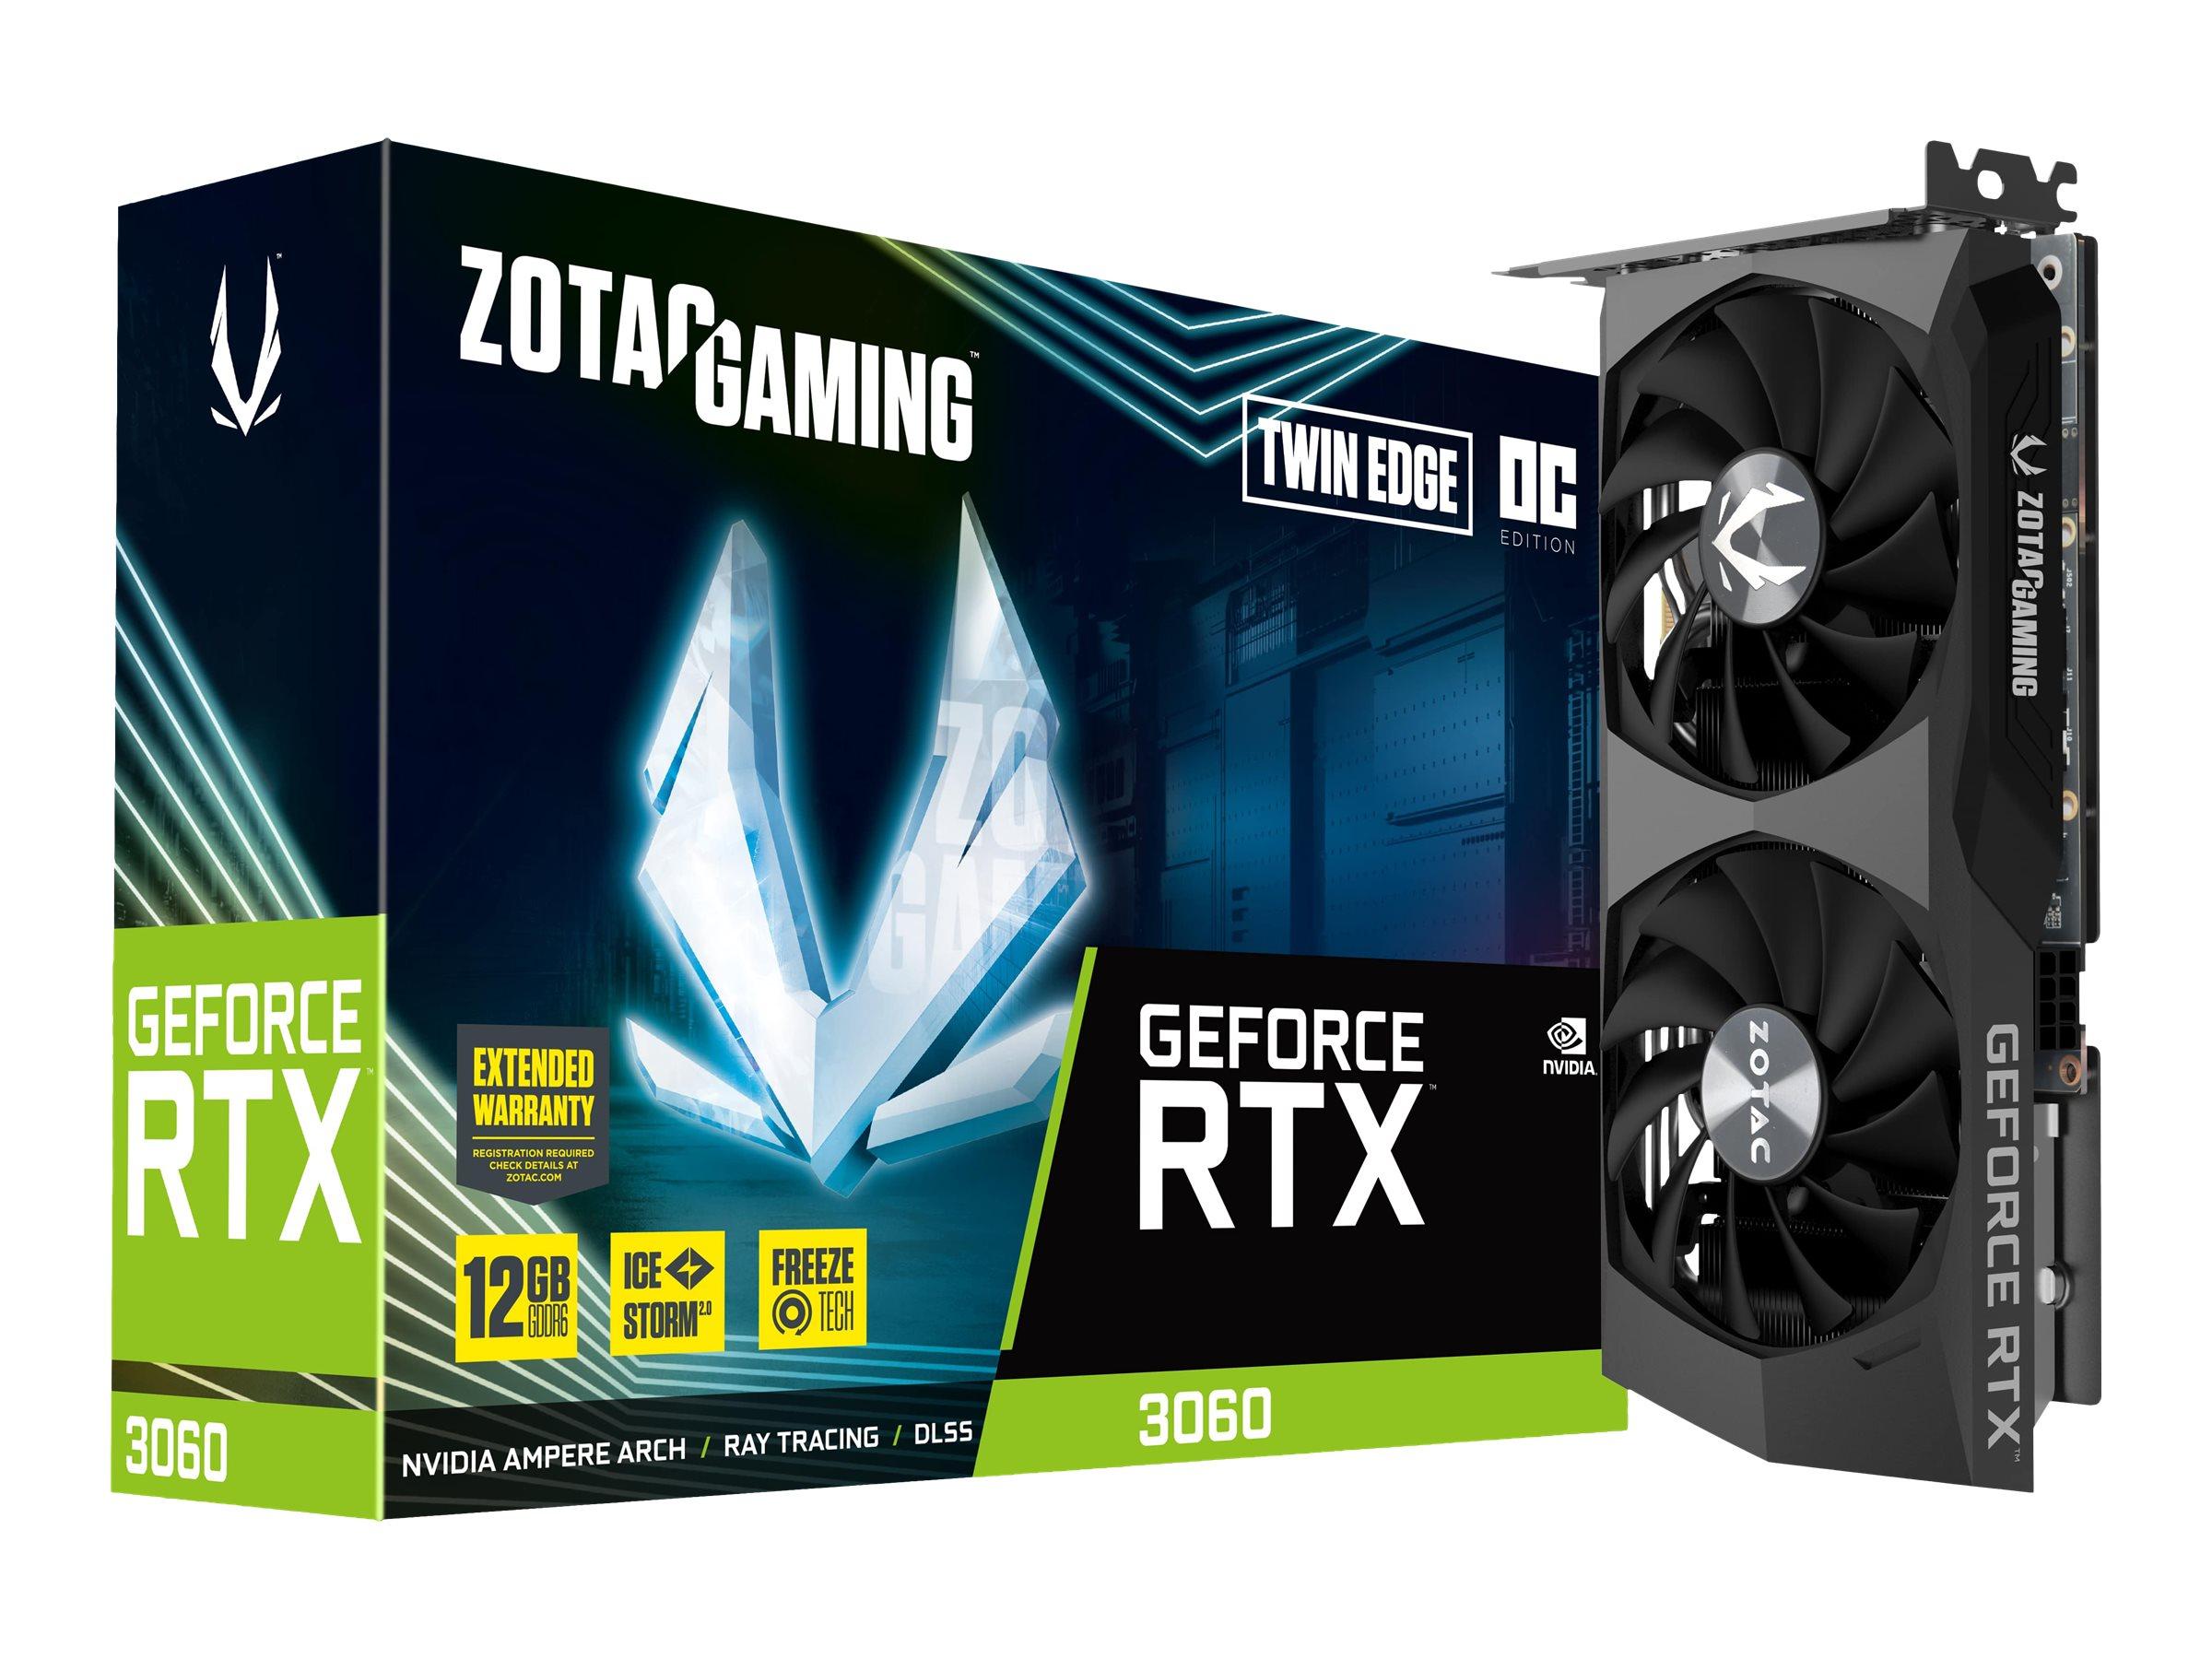 Vorschau: ZOTAC GAMING GeForce RTX 3060 Twin Edge OC - Grafikkarten